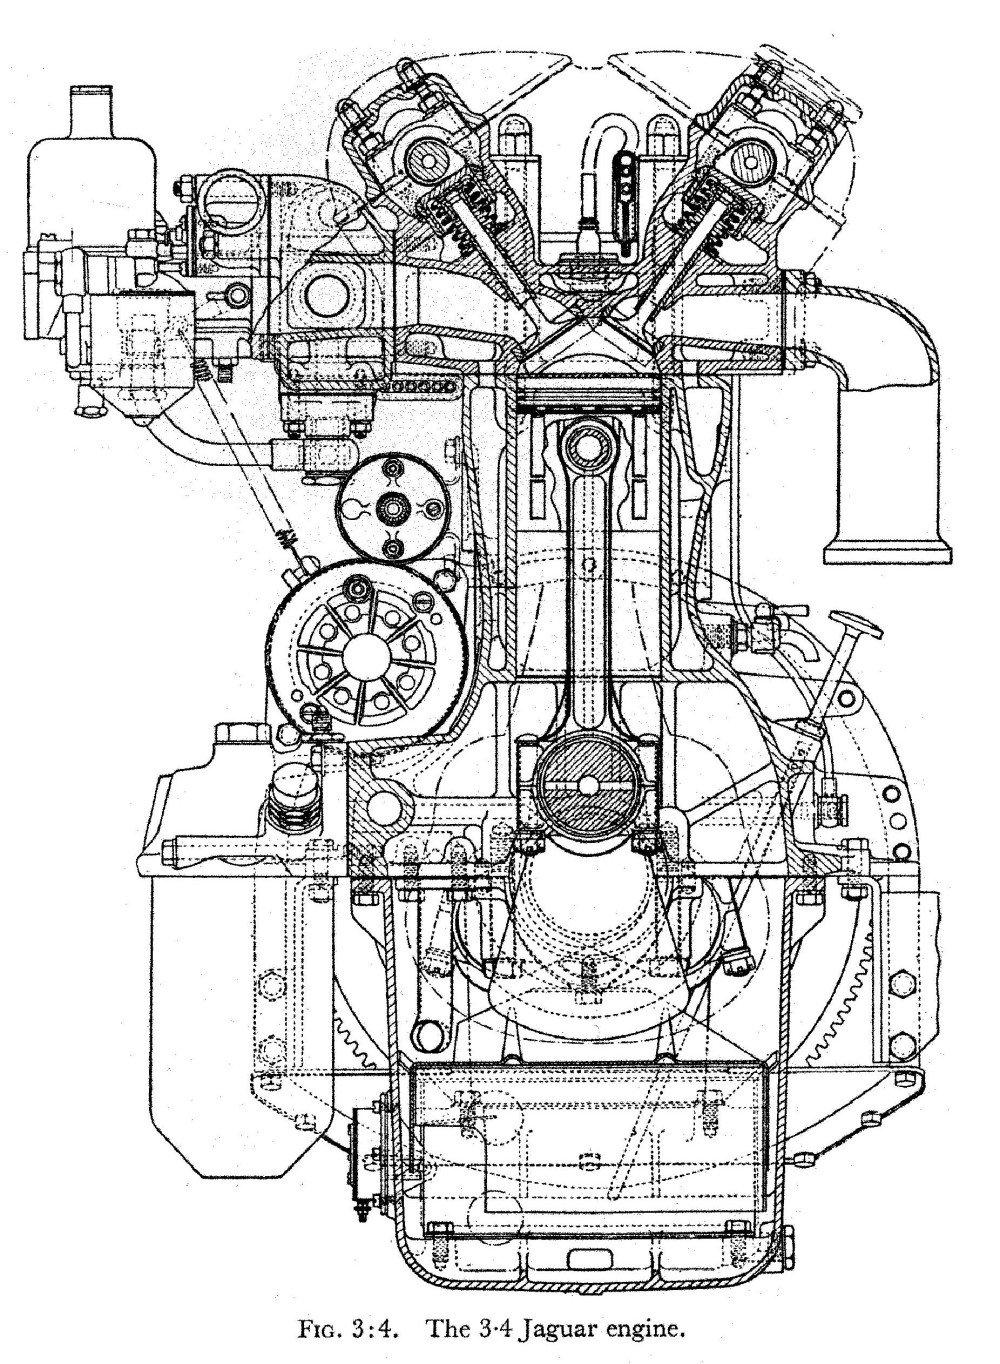 [SCHEMATICS_4PO]  CL_1035] Wiring Harness Engine Ly7 3 6 7 Asm Ly7 3 6 7 Eng Engine Gas 6 Cyl  3 Download Diagram | L76 Engine Diagram |  | Lectr Pimpaps Opein Lave Bapap Basi Phan Mimig Hutpa Mill Timew Momece  Mopar Cran Osuri Licuk Mohammedshrine Librar Wiring 101